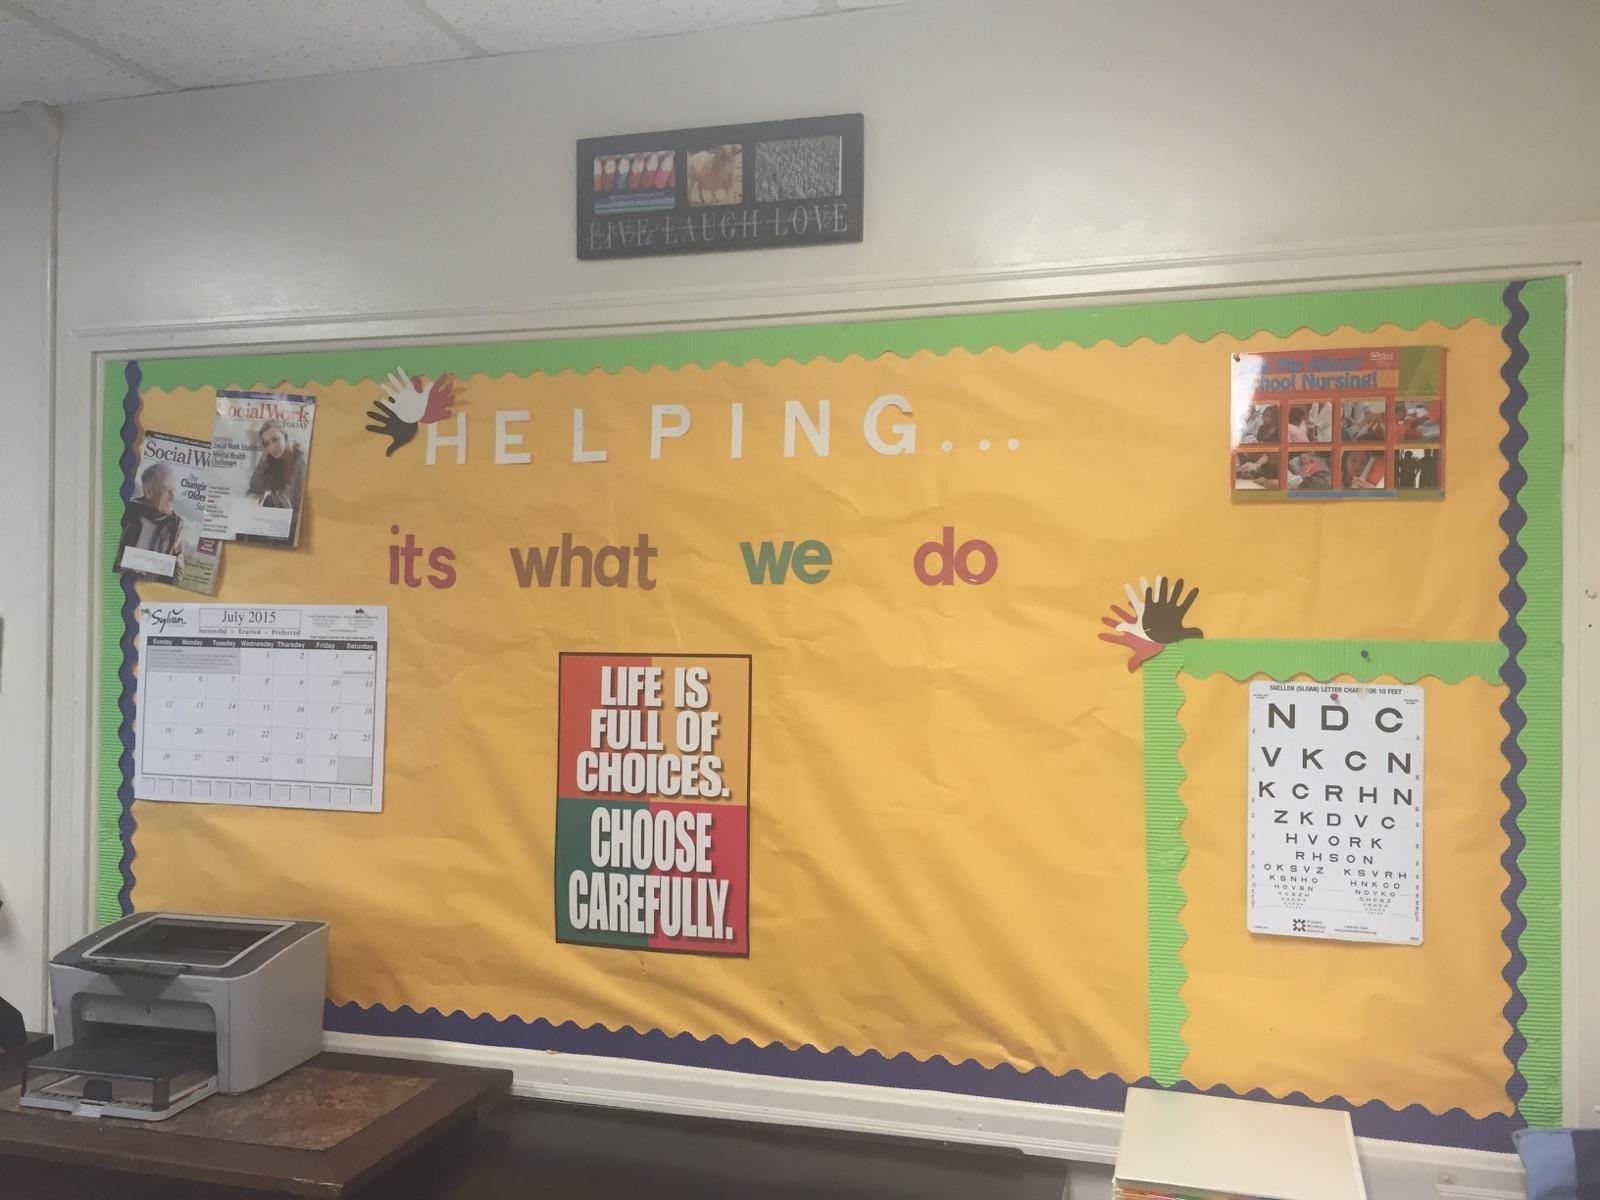 School Social Work Office Bulletin Board Decorated By Melanie Lee Of Grimsley High School North Carolina Social Work Offices School Social Work Social Work